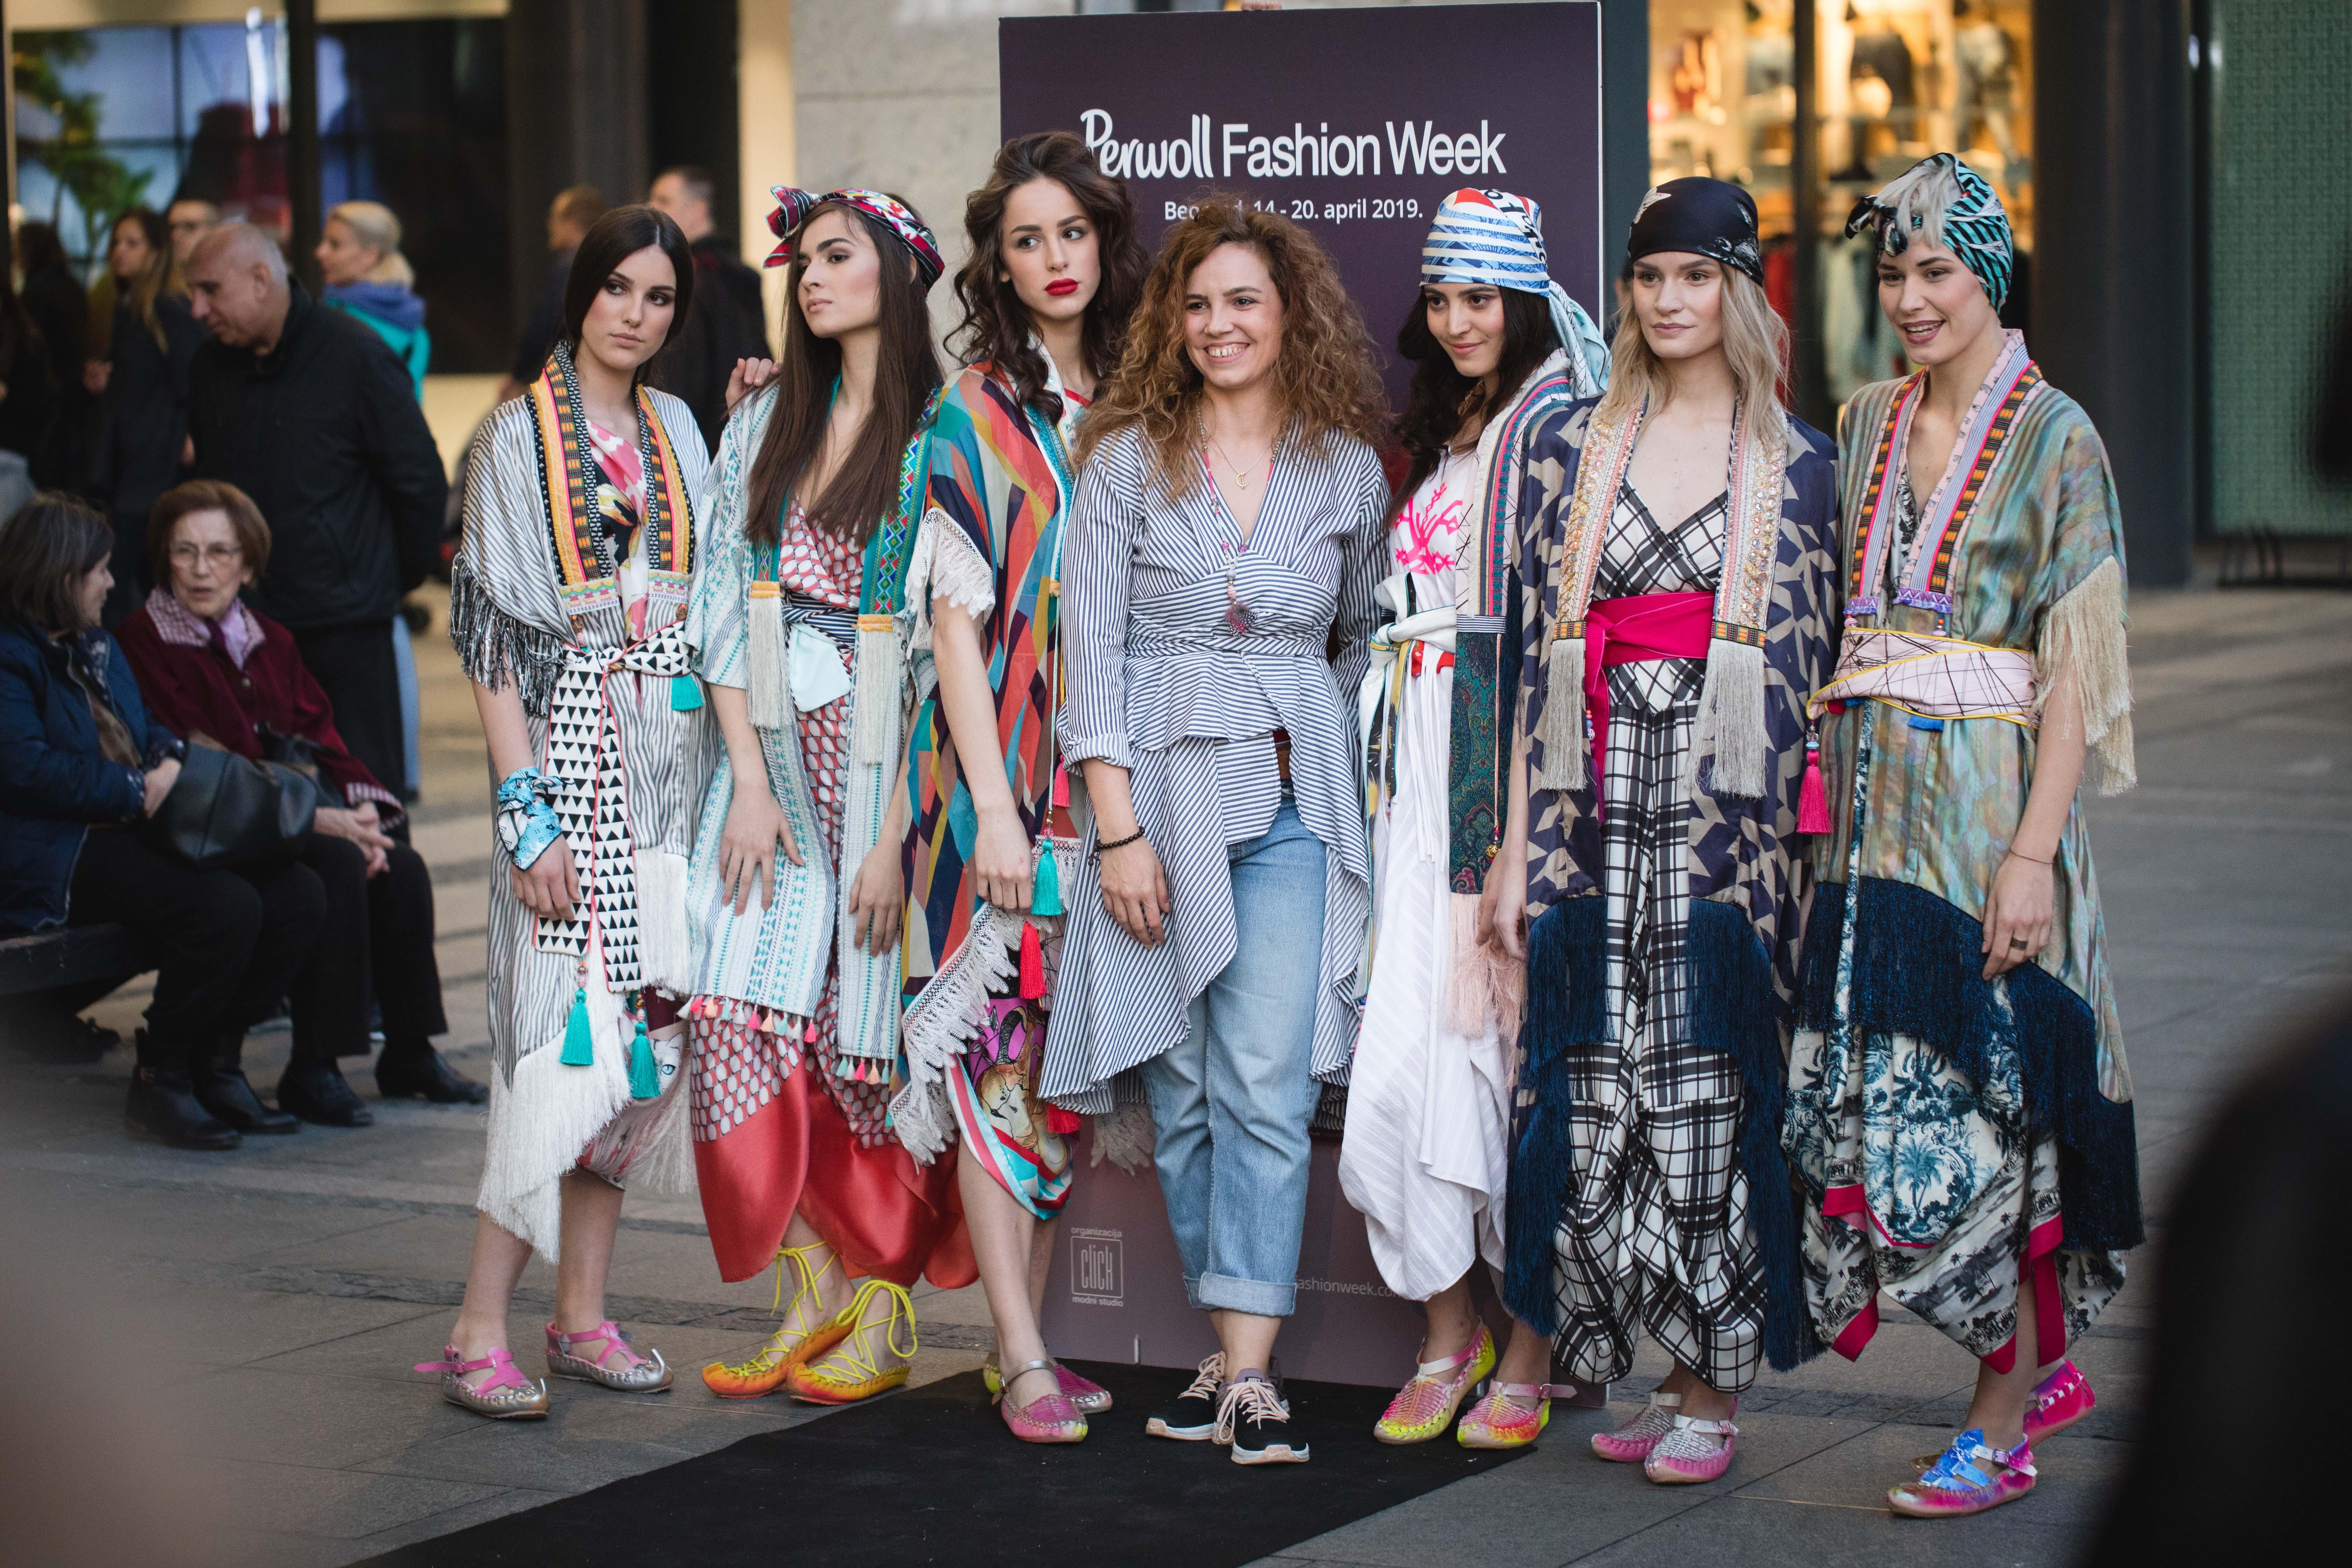 Andrej Mihailovic Gerila 8 Perwoll Fashion Week: Otvorena izložba A New Beginning